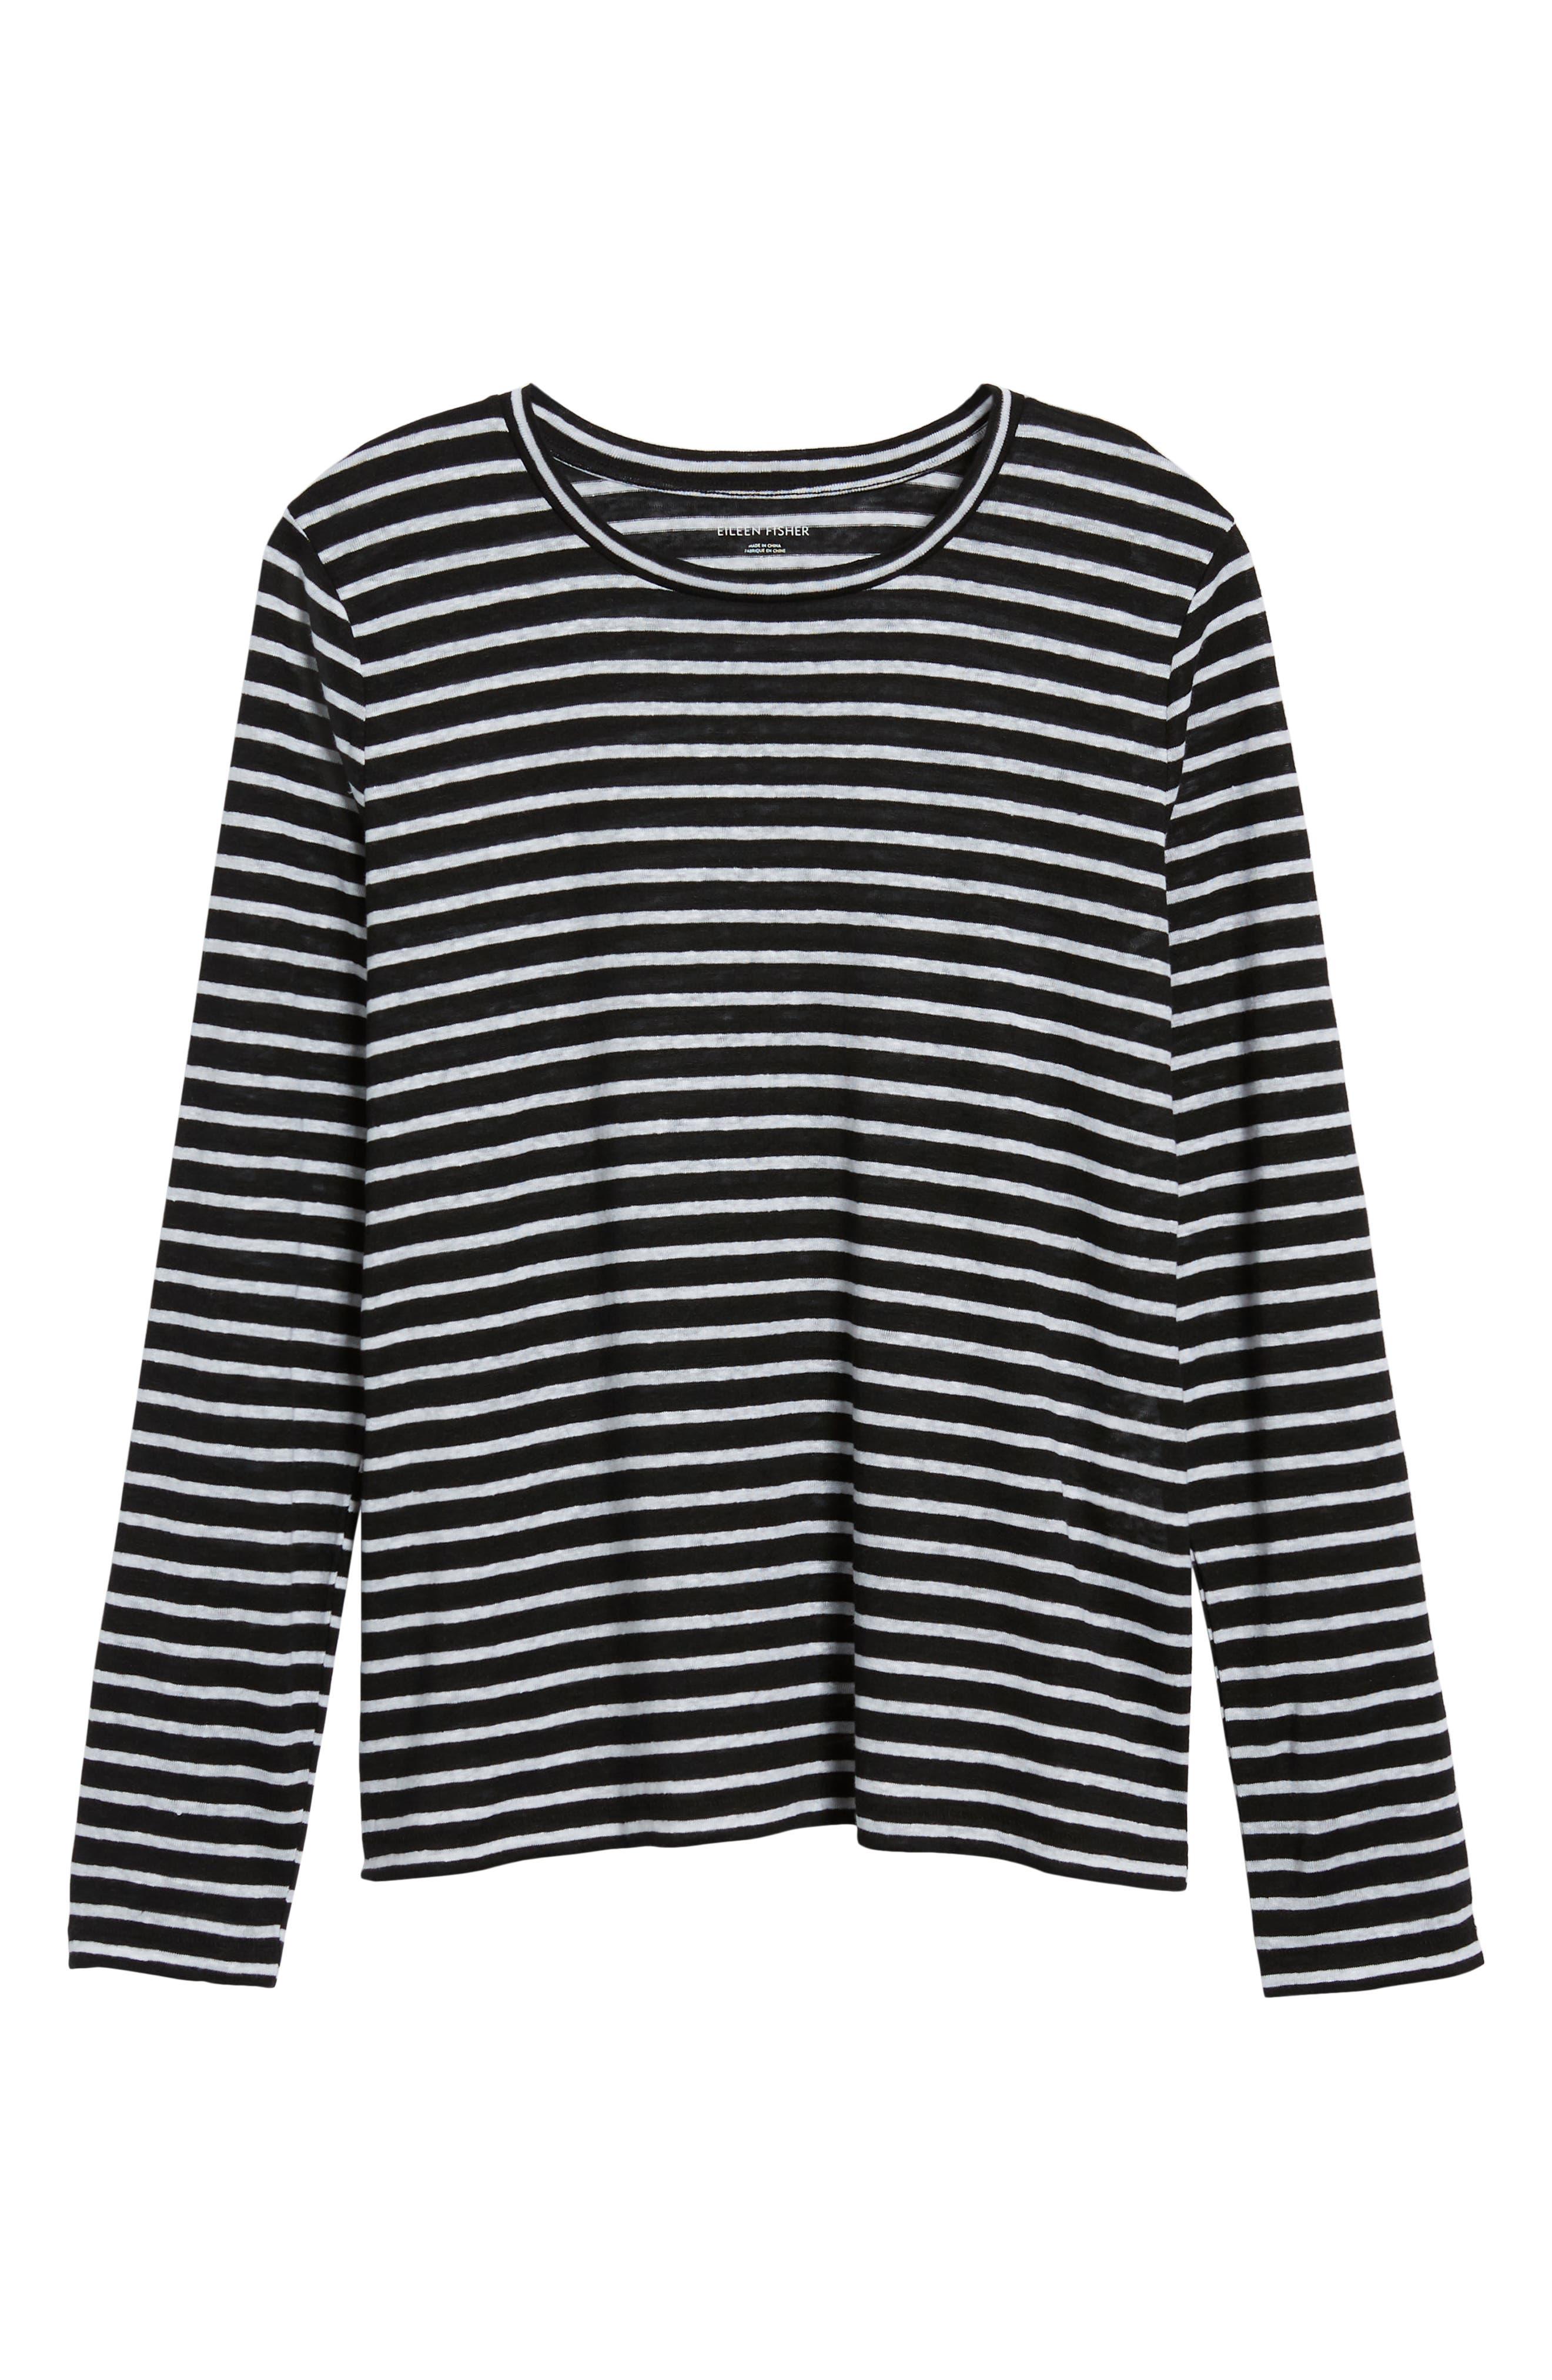 Stripe Organic Linen Top,                             Alternate thumbnail 7, color,                             Black/ White